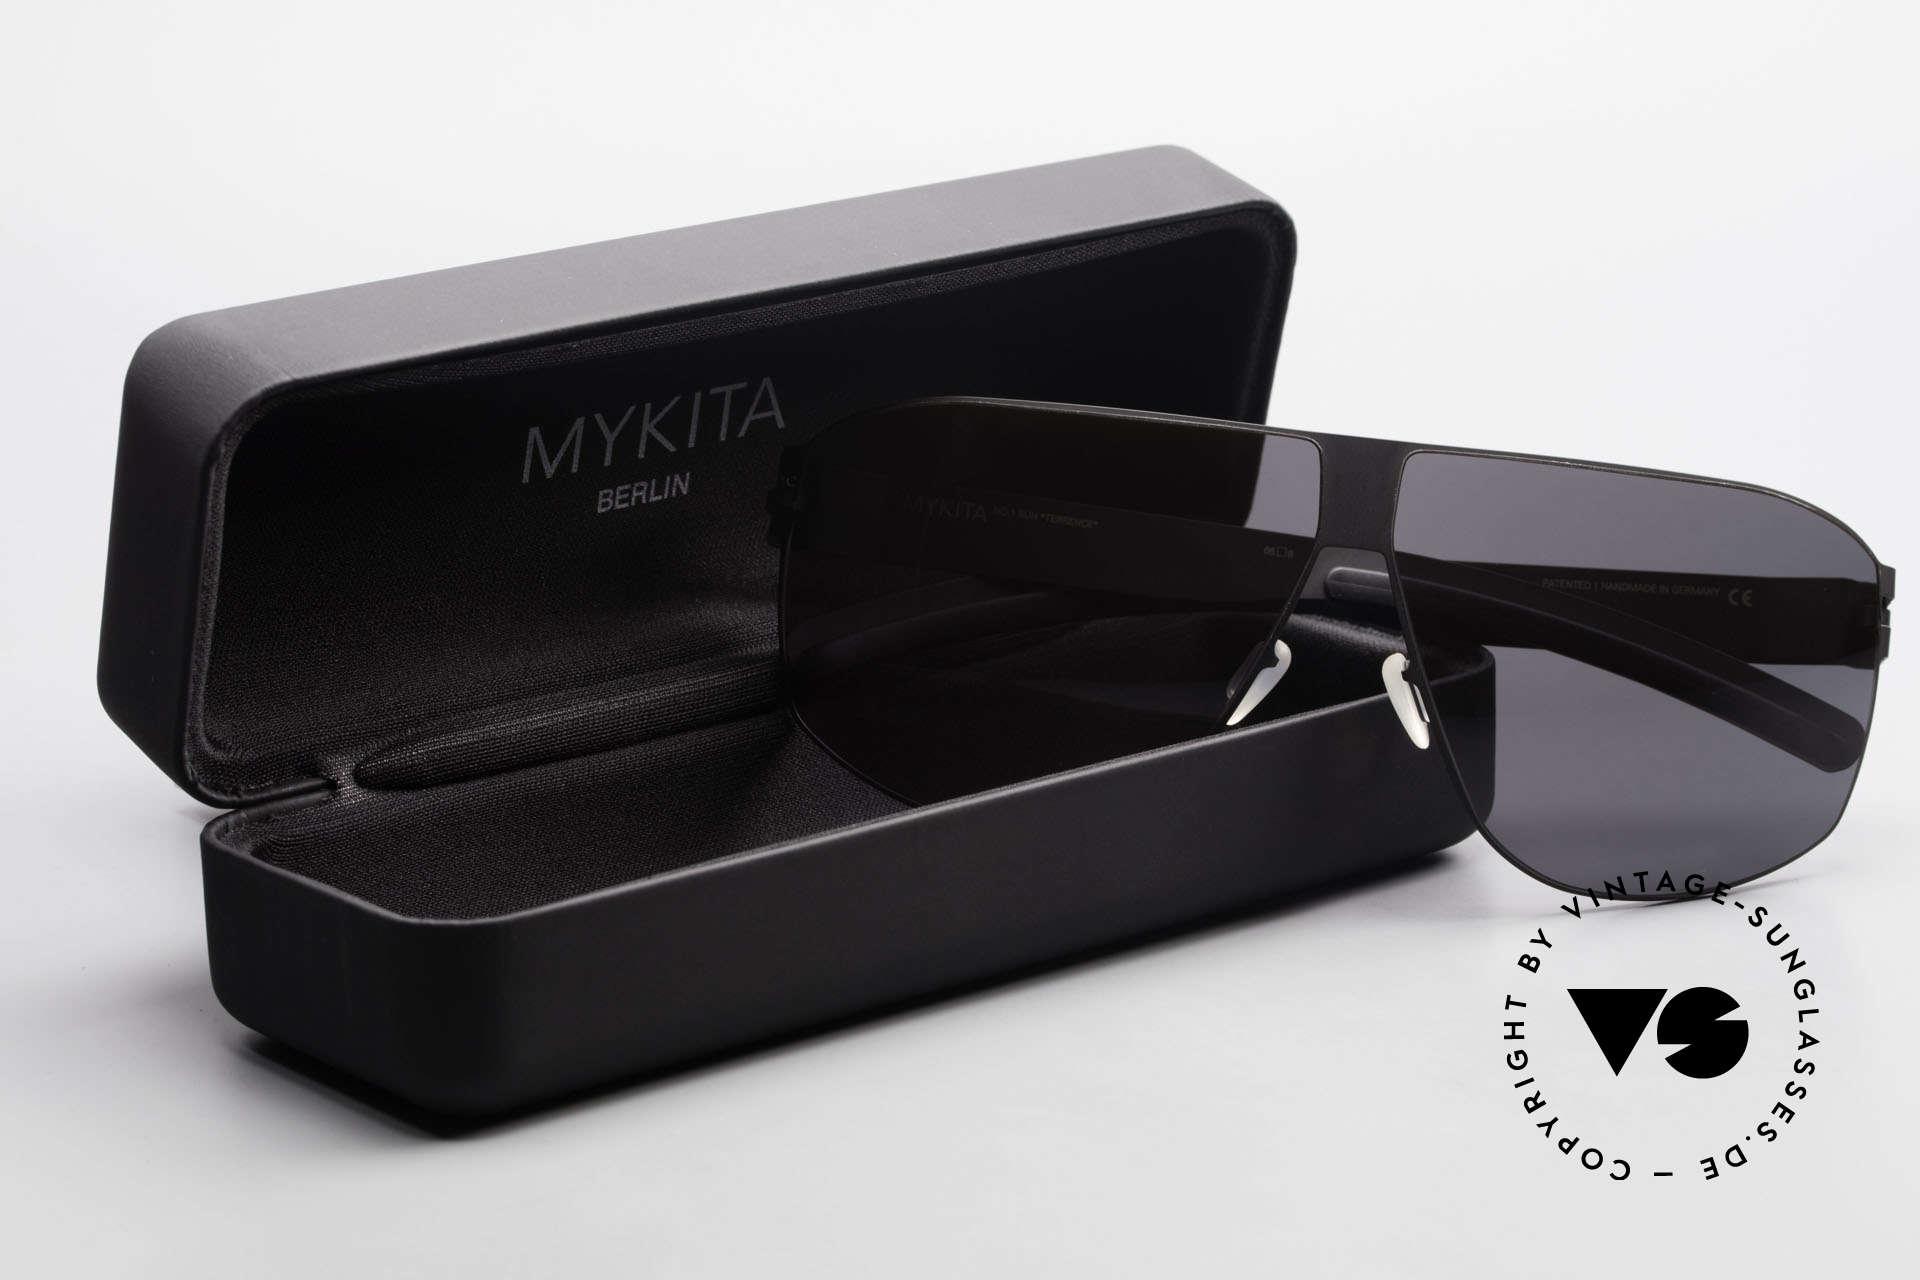 Mykita Terrence Vintage Mykita Sunglasses 2011, Size: large, Made for Men